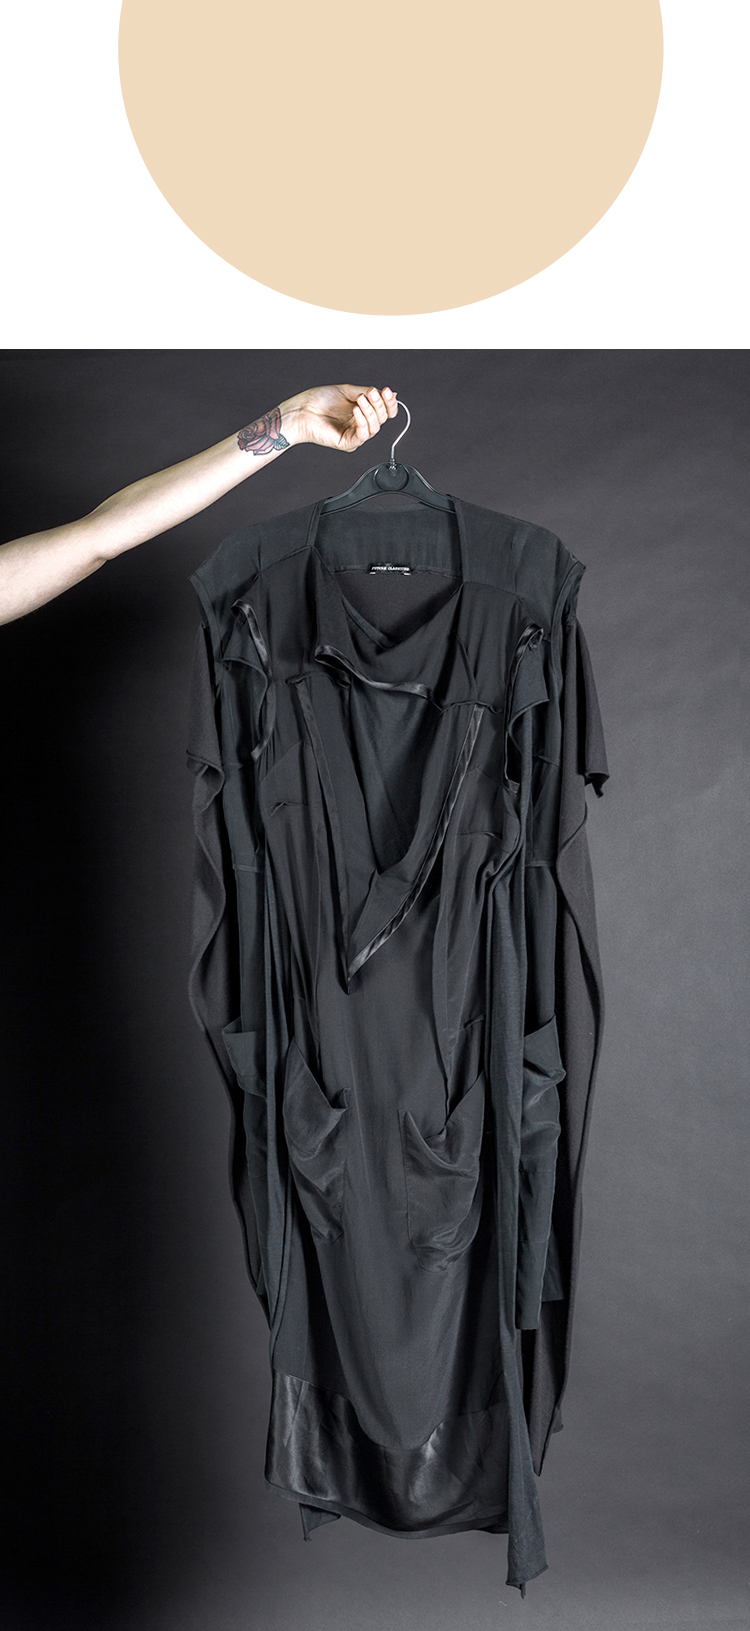 DRESS ltd BLACK DRESS MUSEUM Flat pack Double Deconstruction Dress